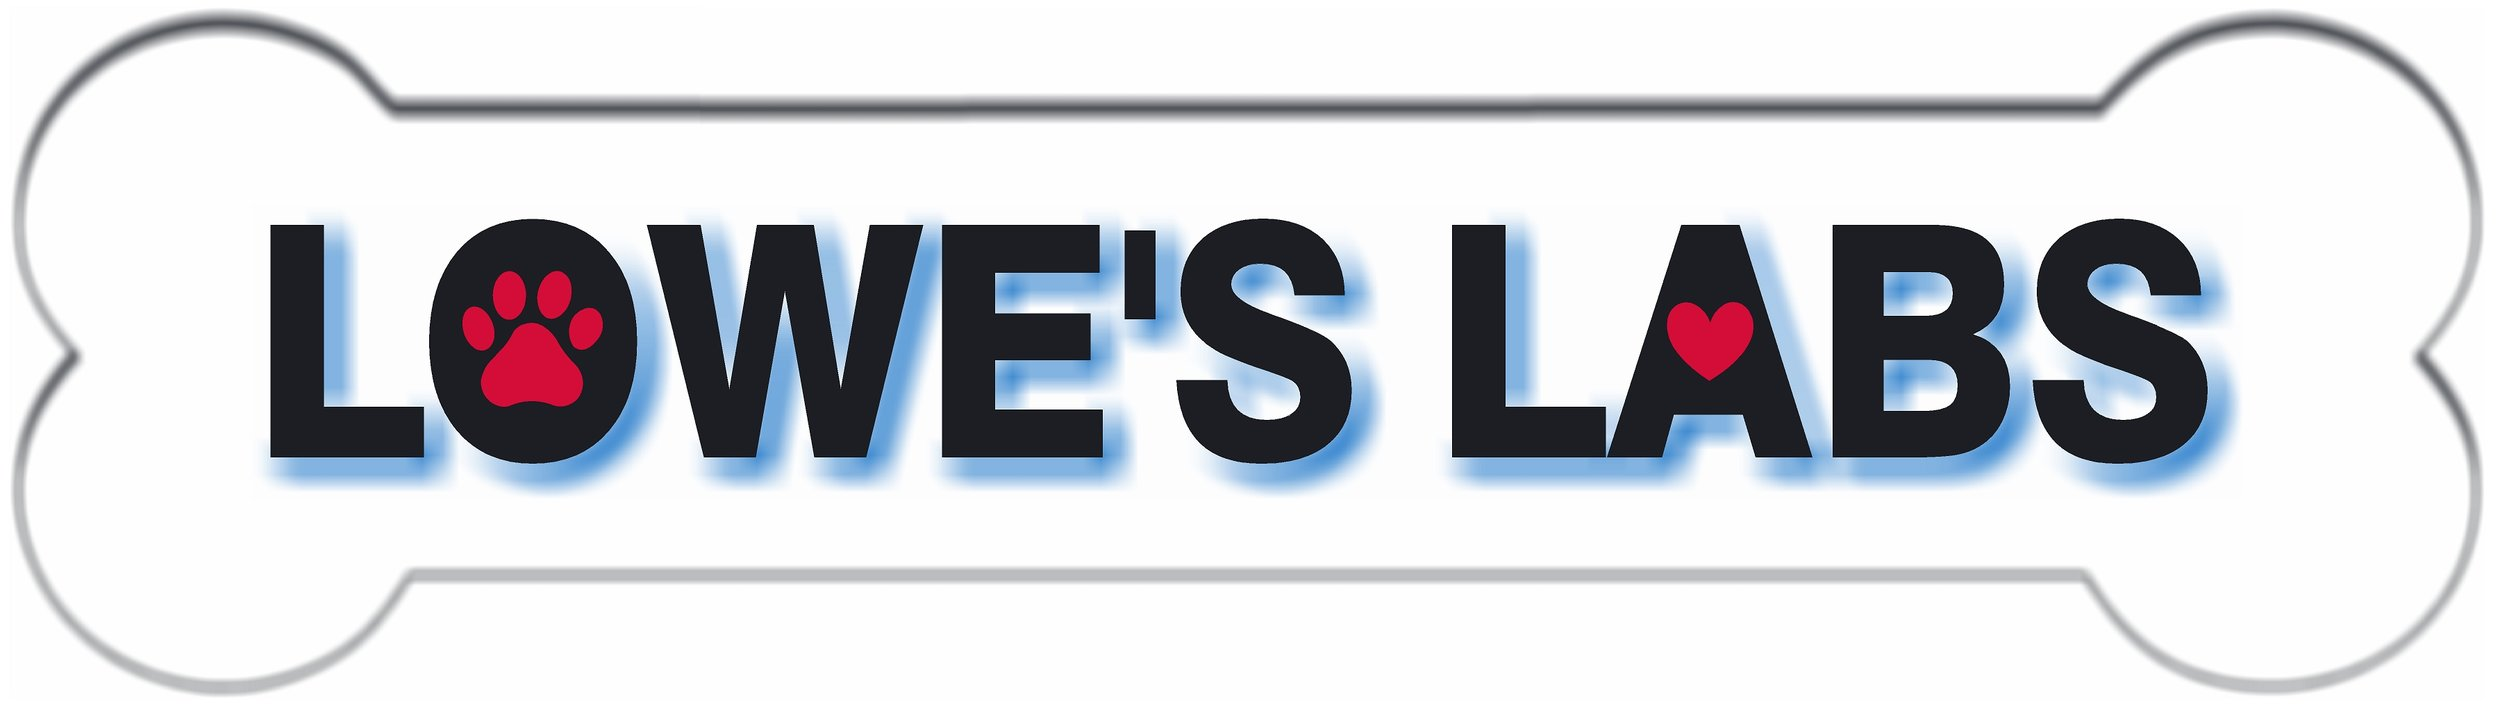 LOWE'S LABS LOGO.jpg